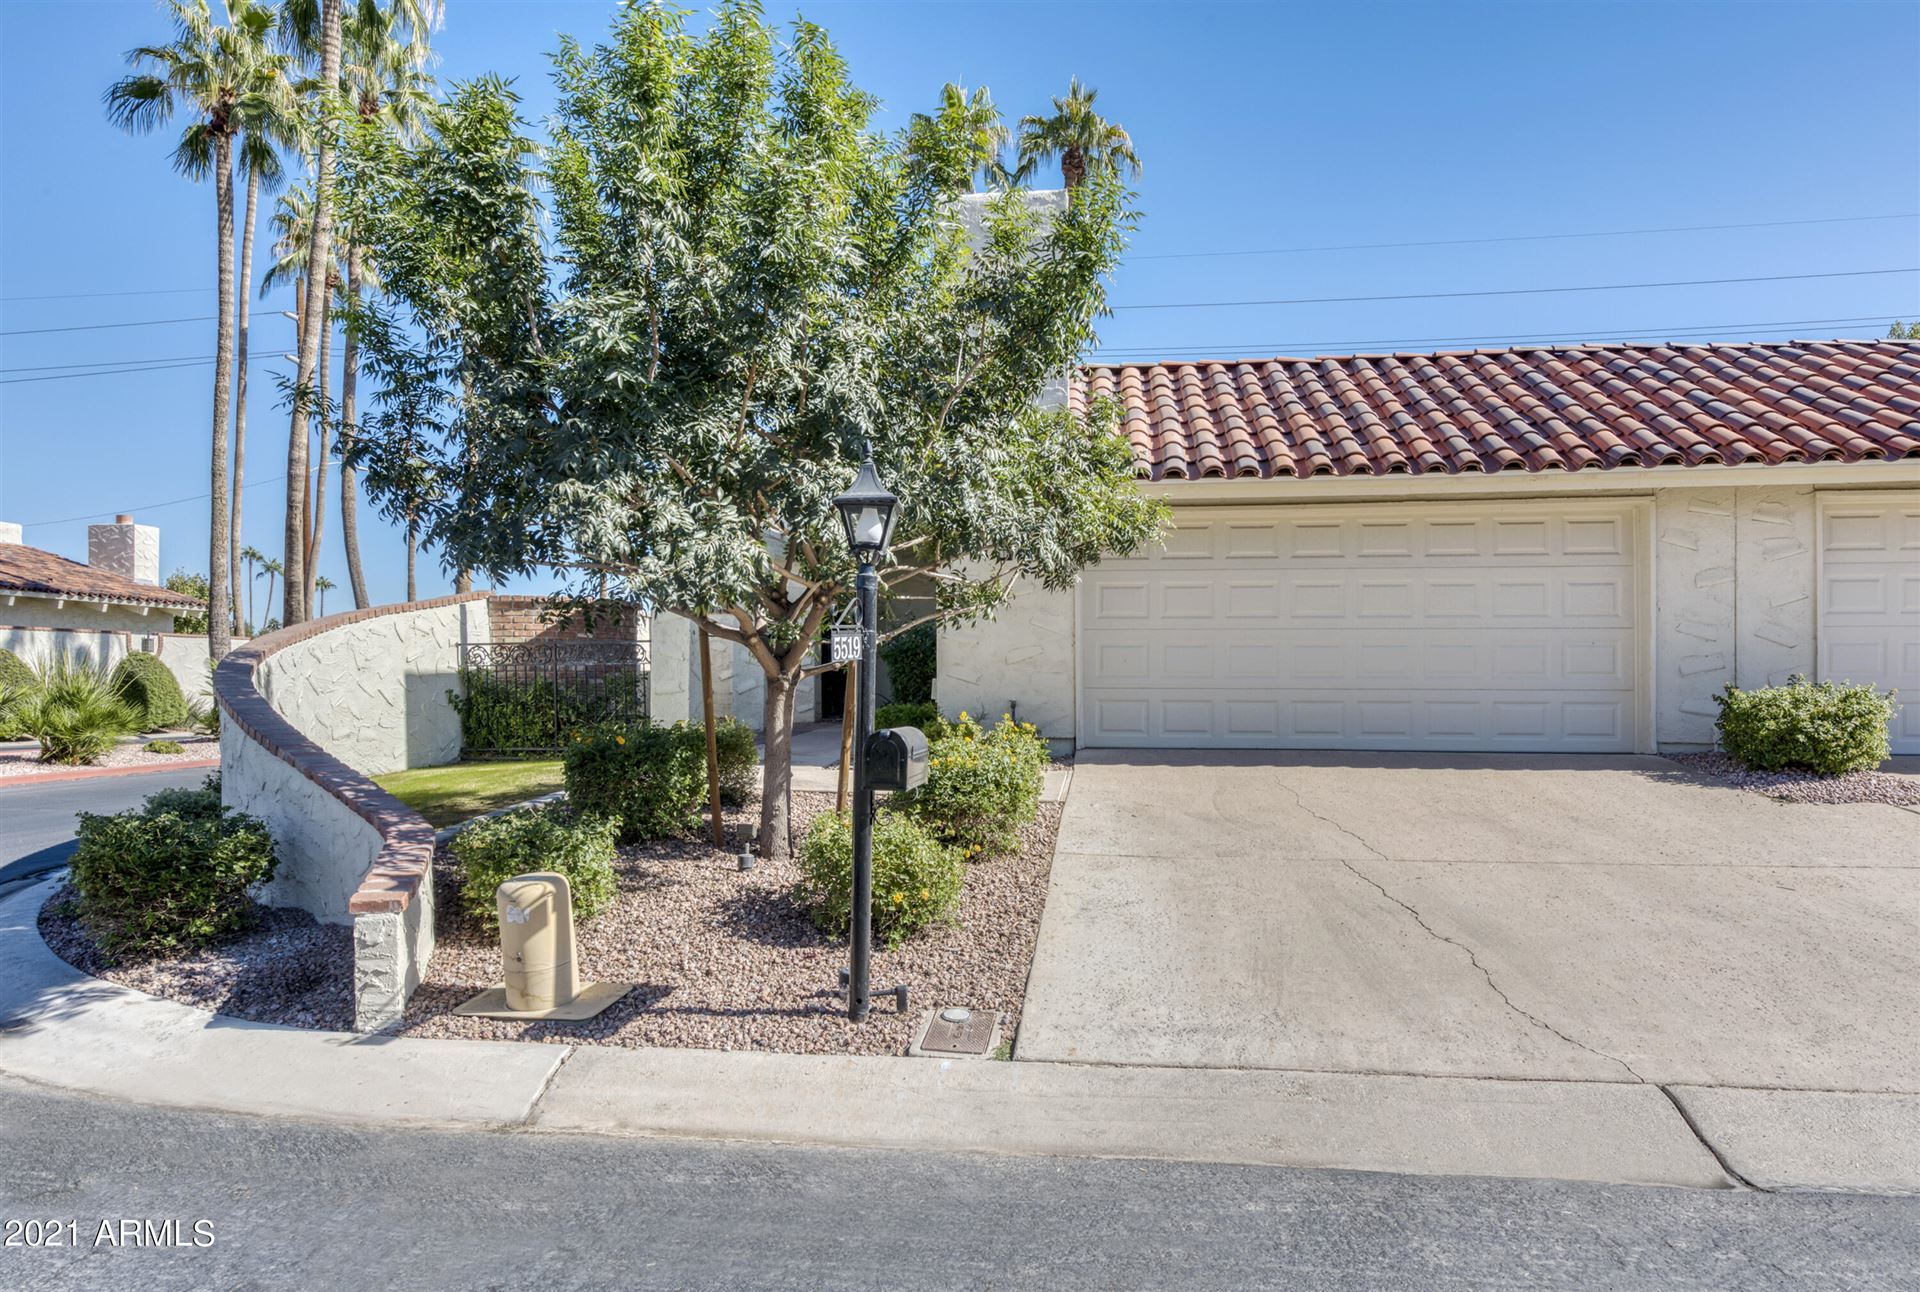 Photo of 5519 N 71st Place, Paradise Valley, AZ 85253 (MLS # 6305031)